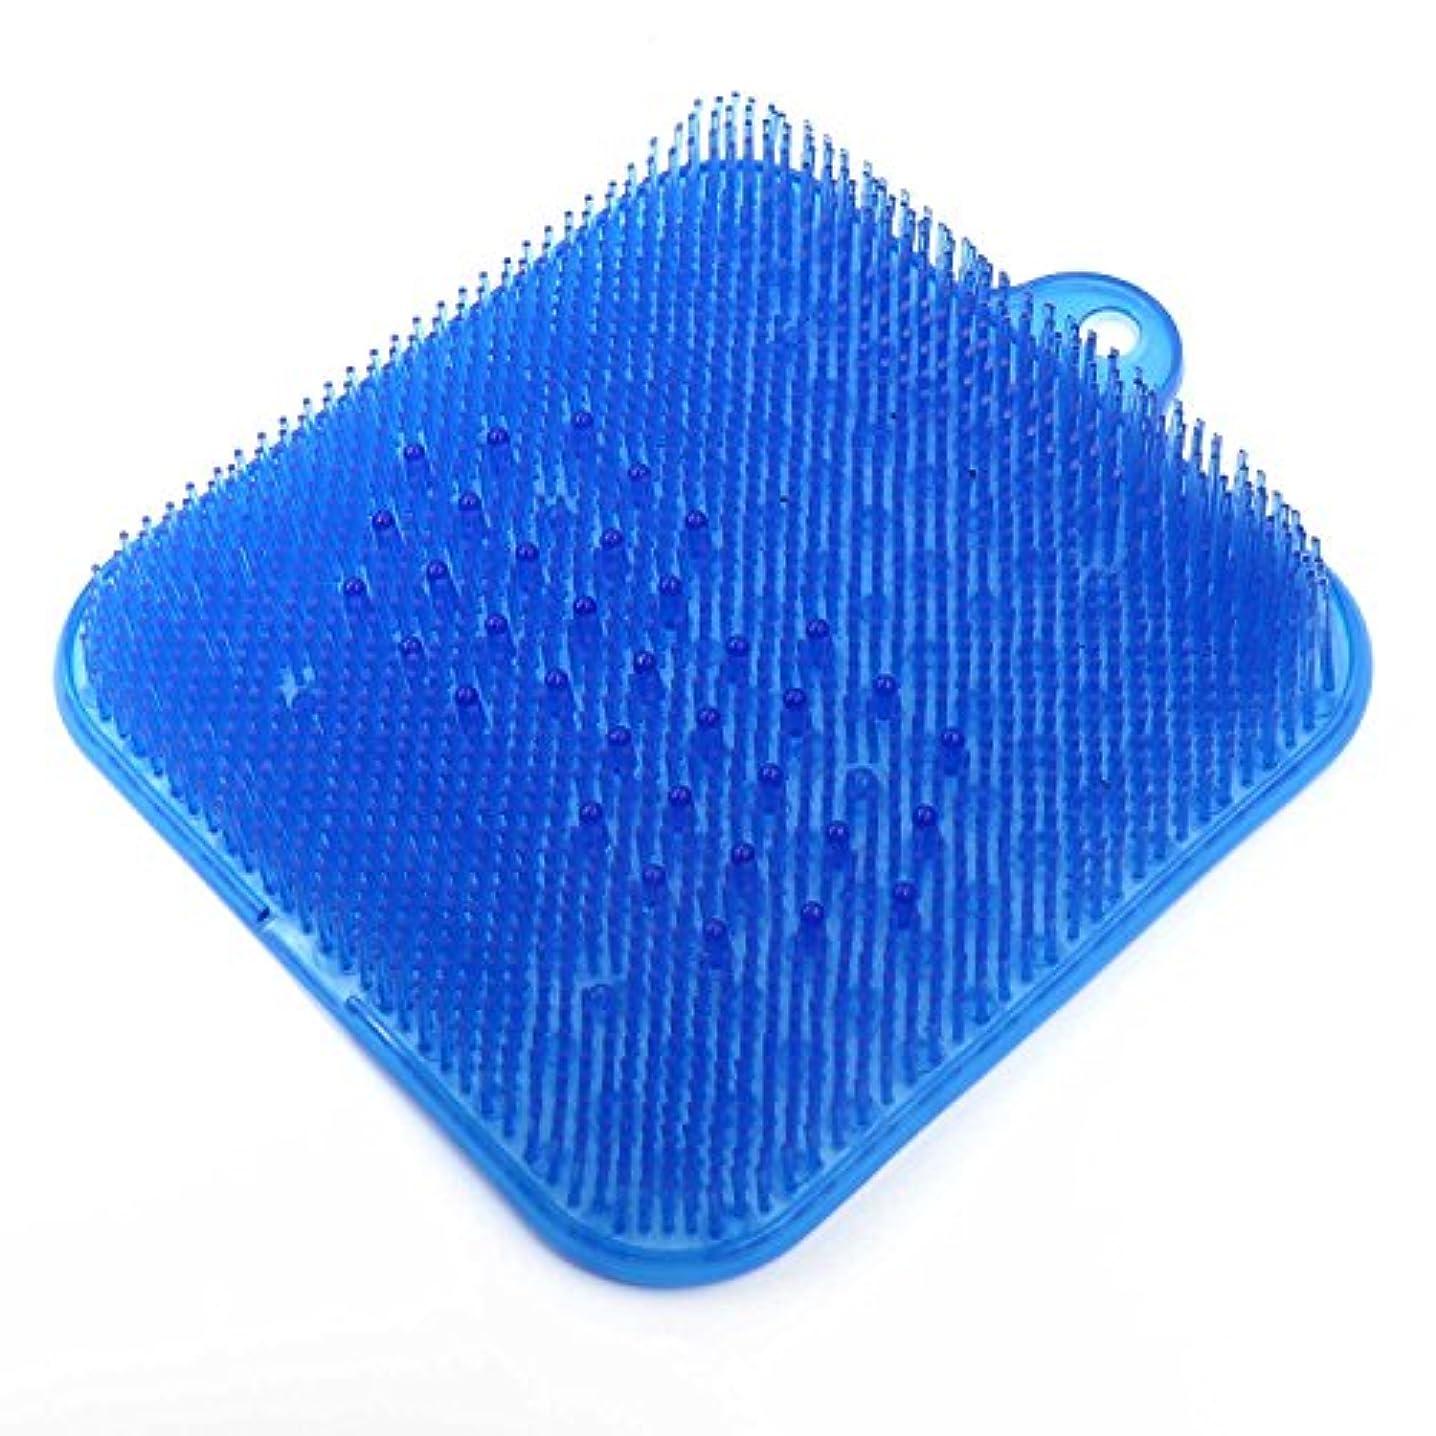 DigHealth 足洗いマット ブルー